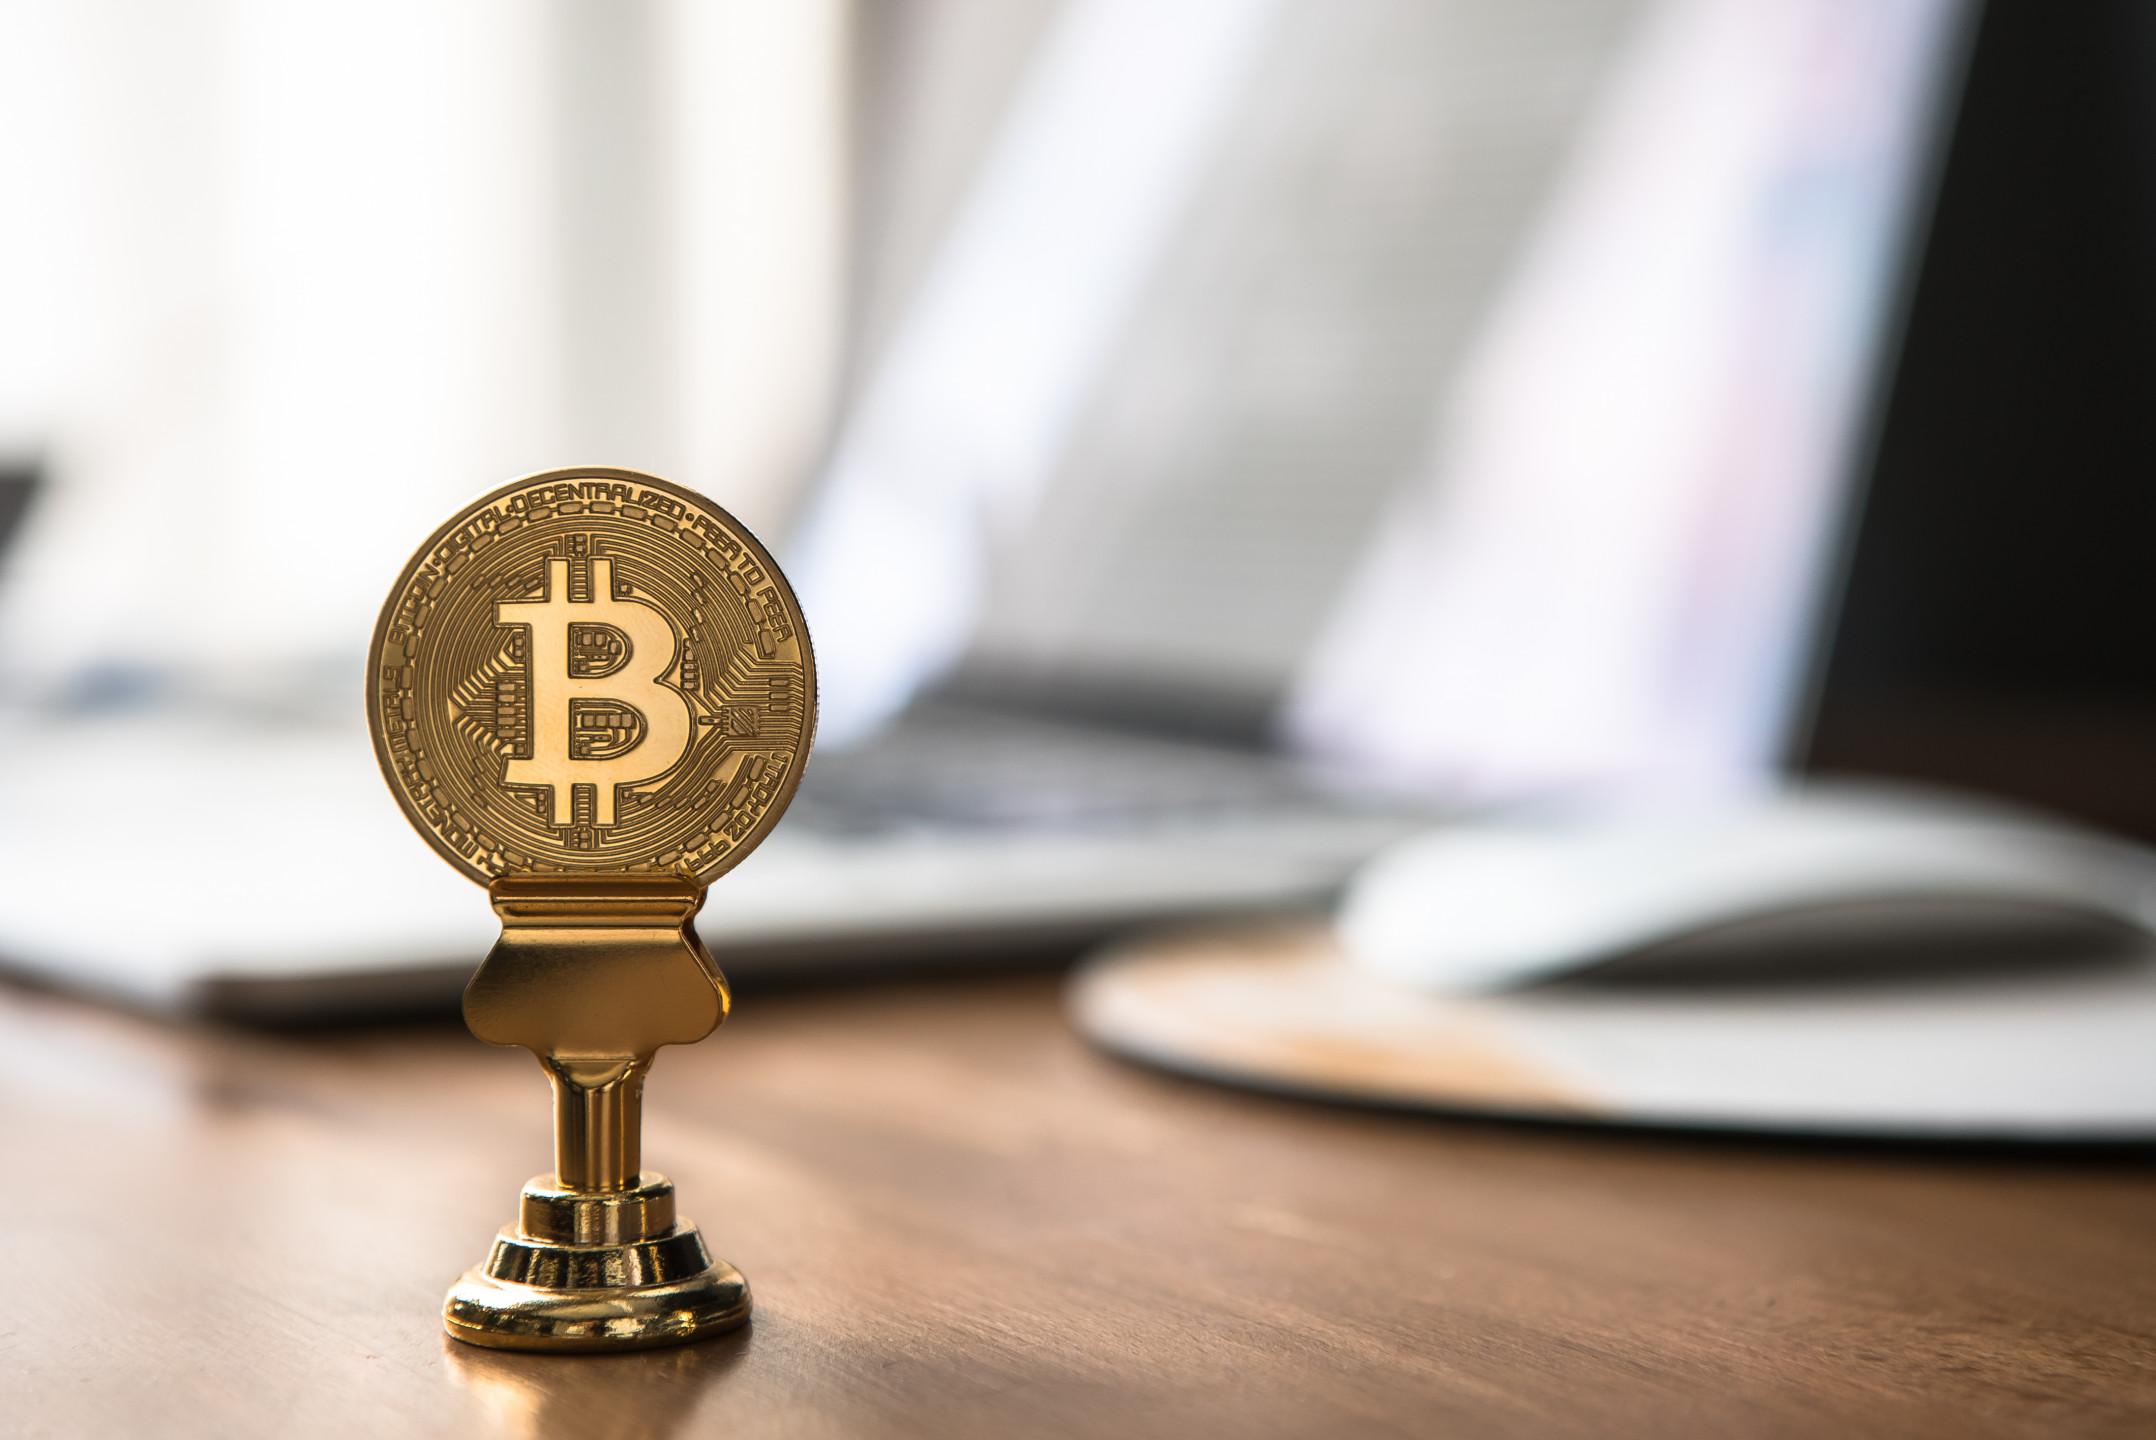 Bitcoin price analysis - BTCUSD testing towards $9000